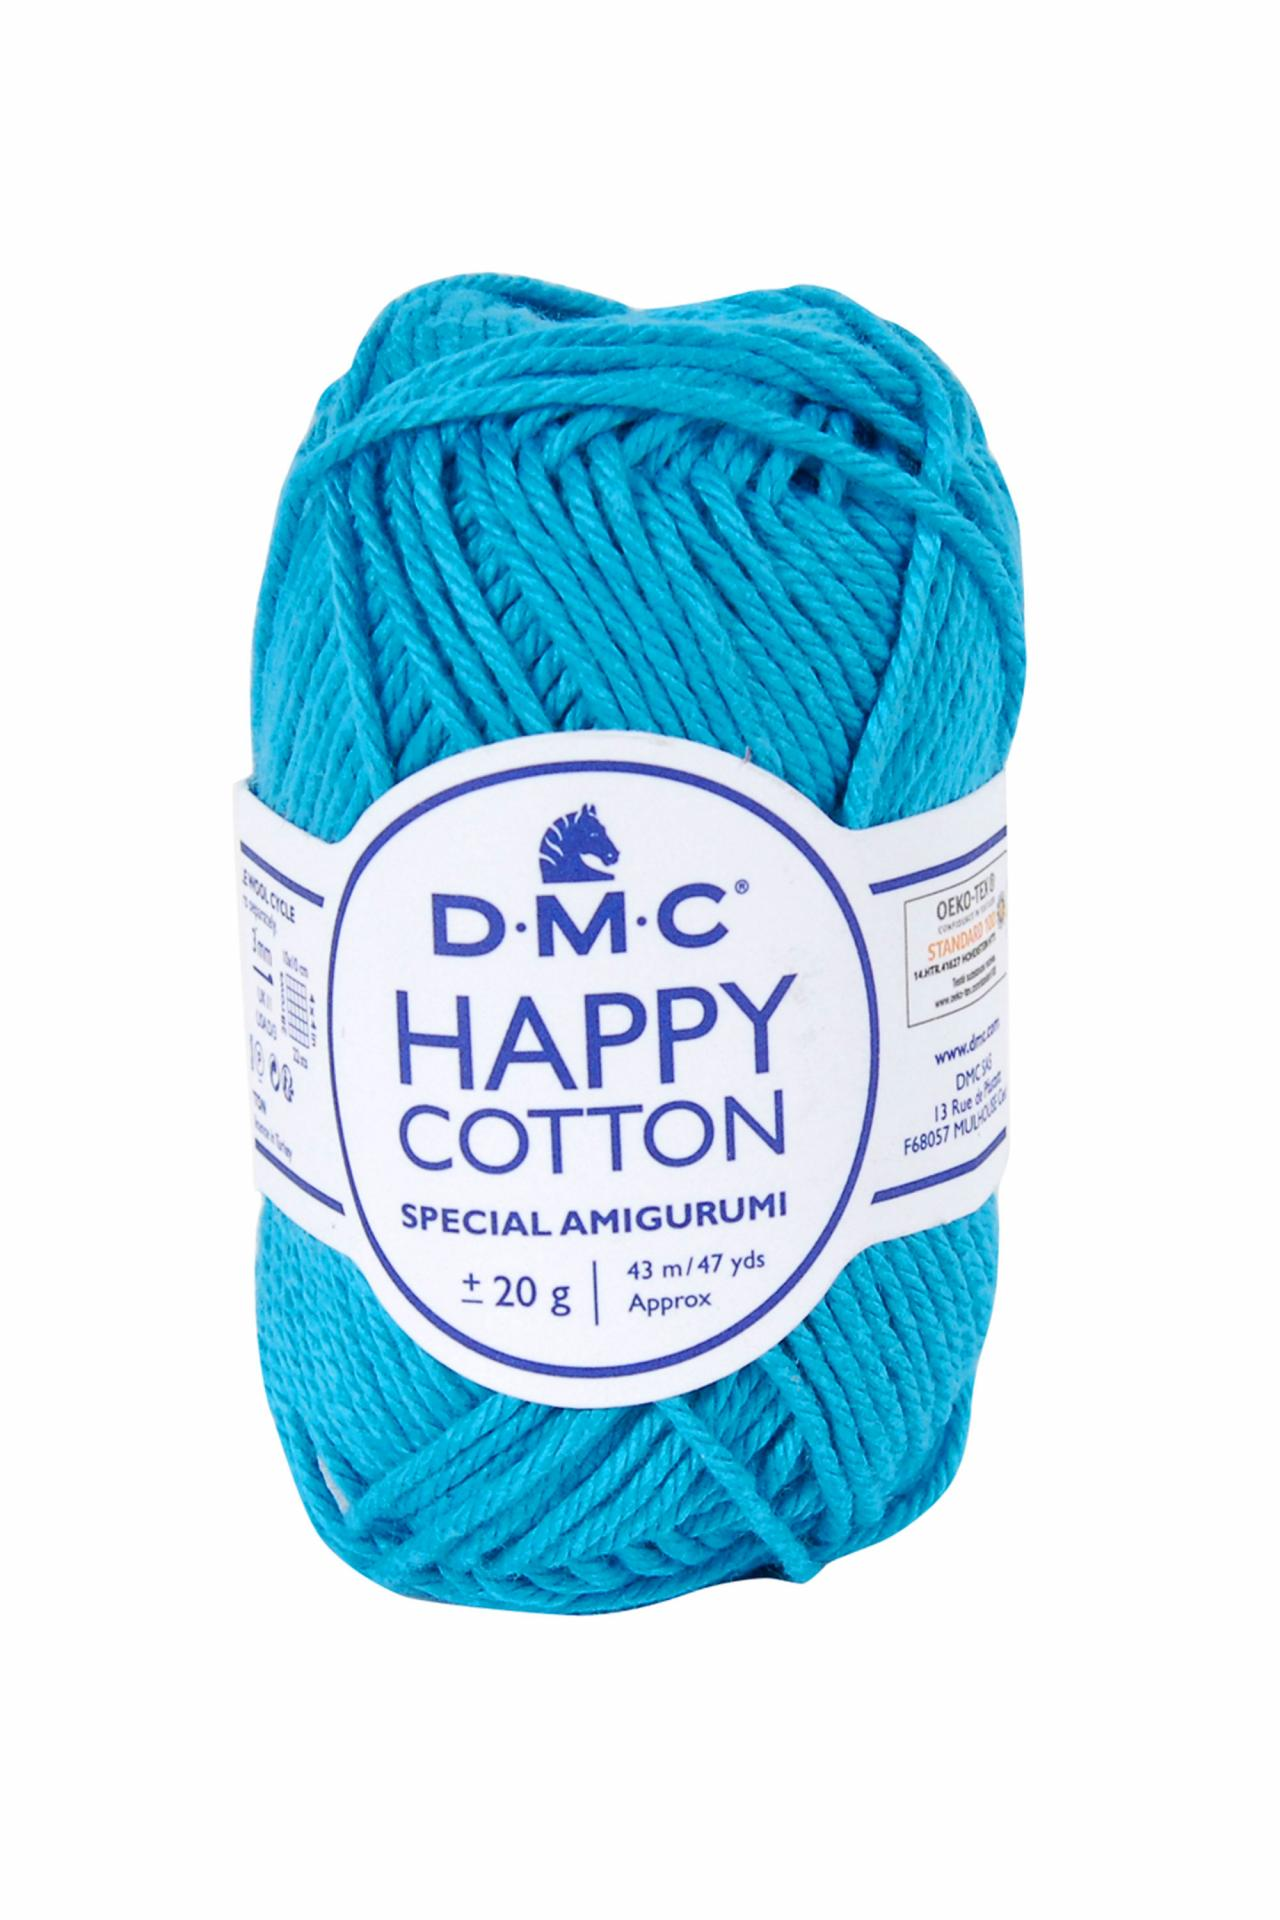 Hilo DMC Happy Cotton 786